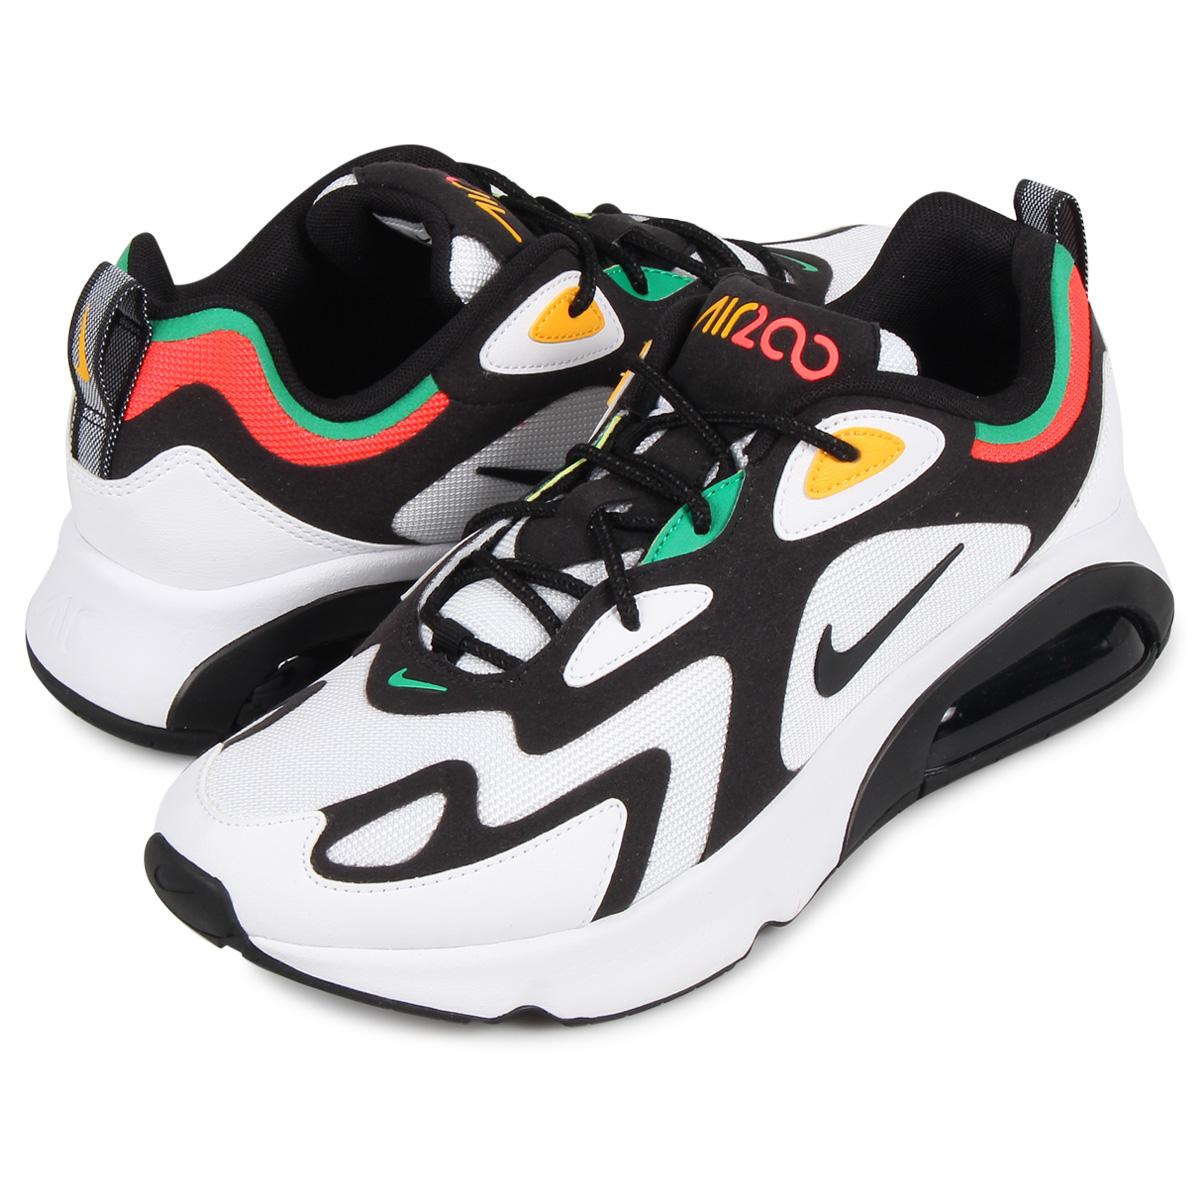 Nike NIKE Air Max 200 sneakers men AIR MAX 200 white white AQ2568 101